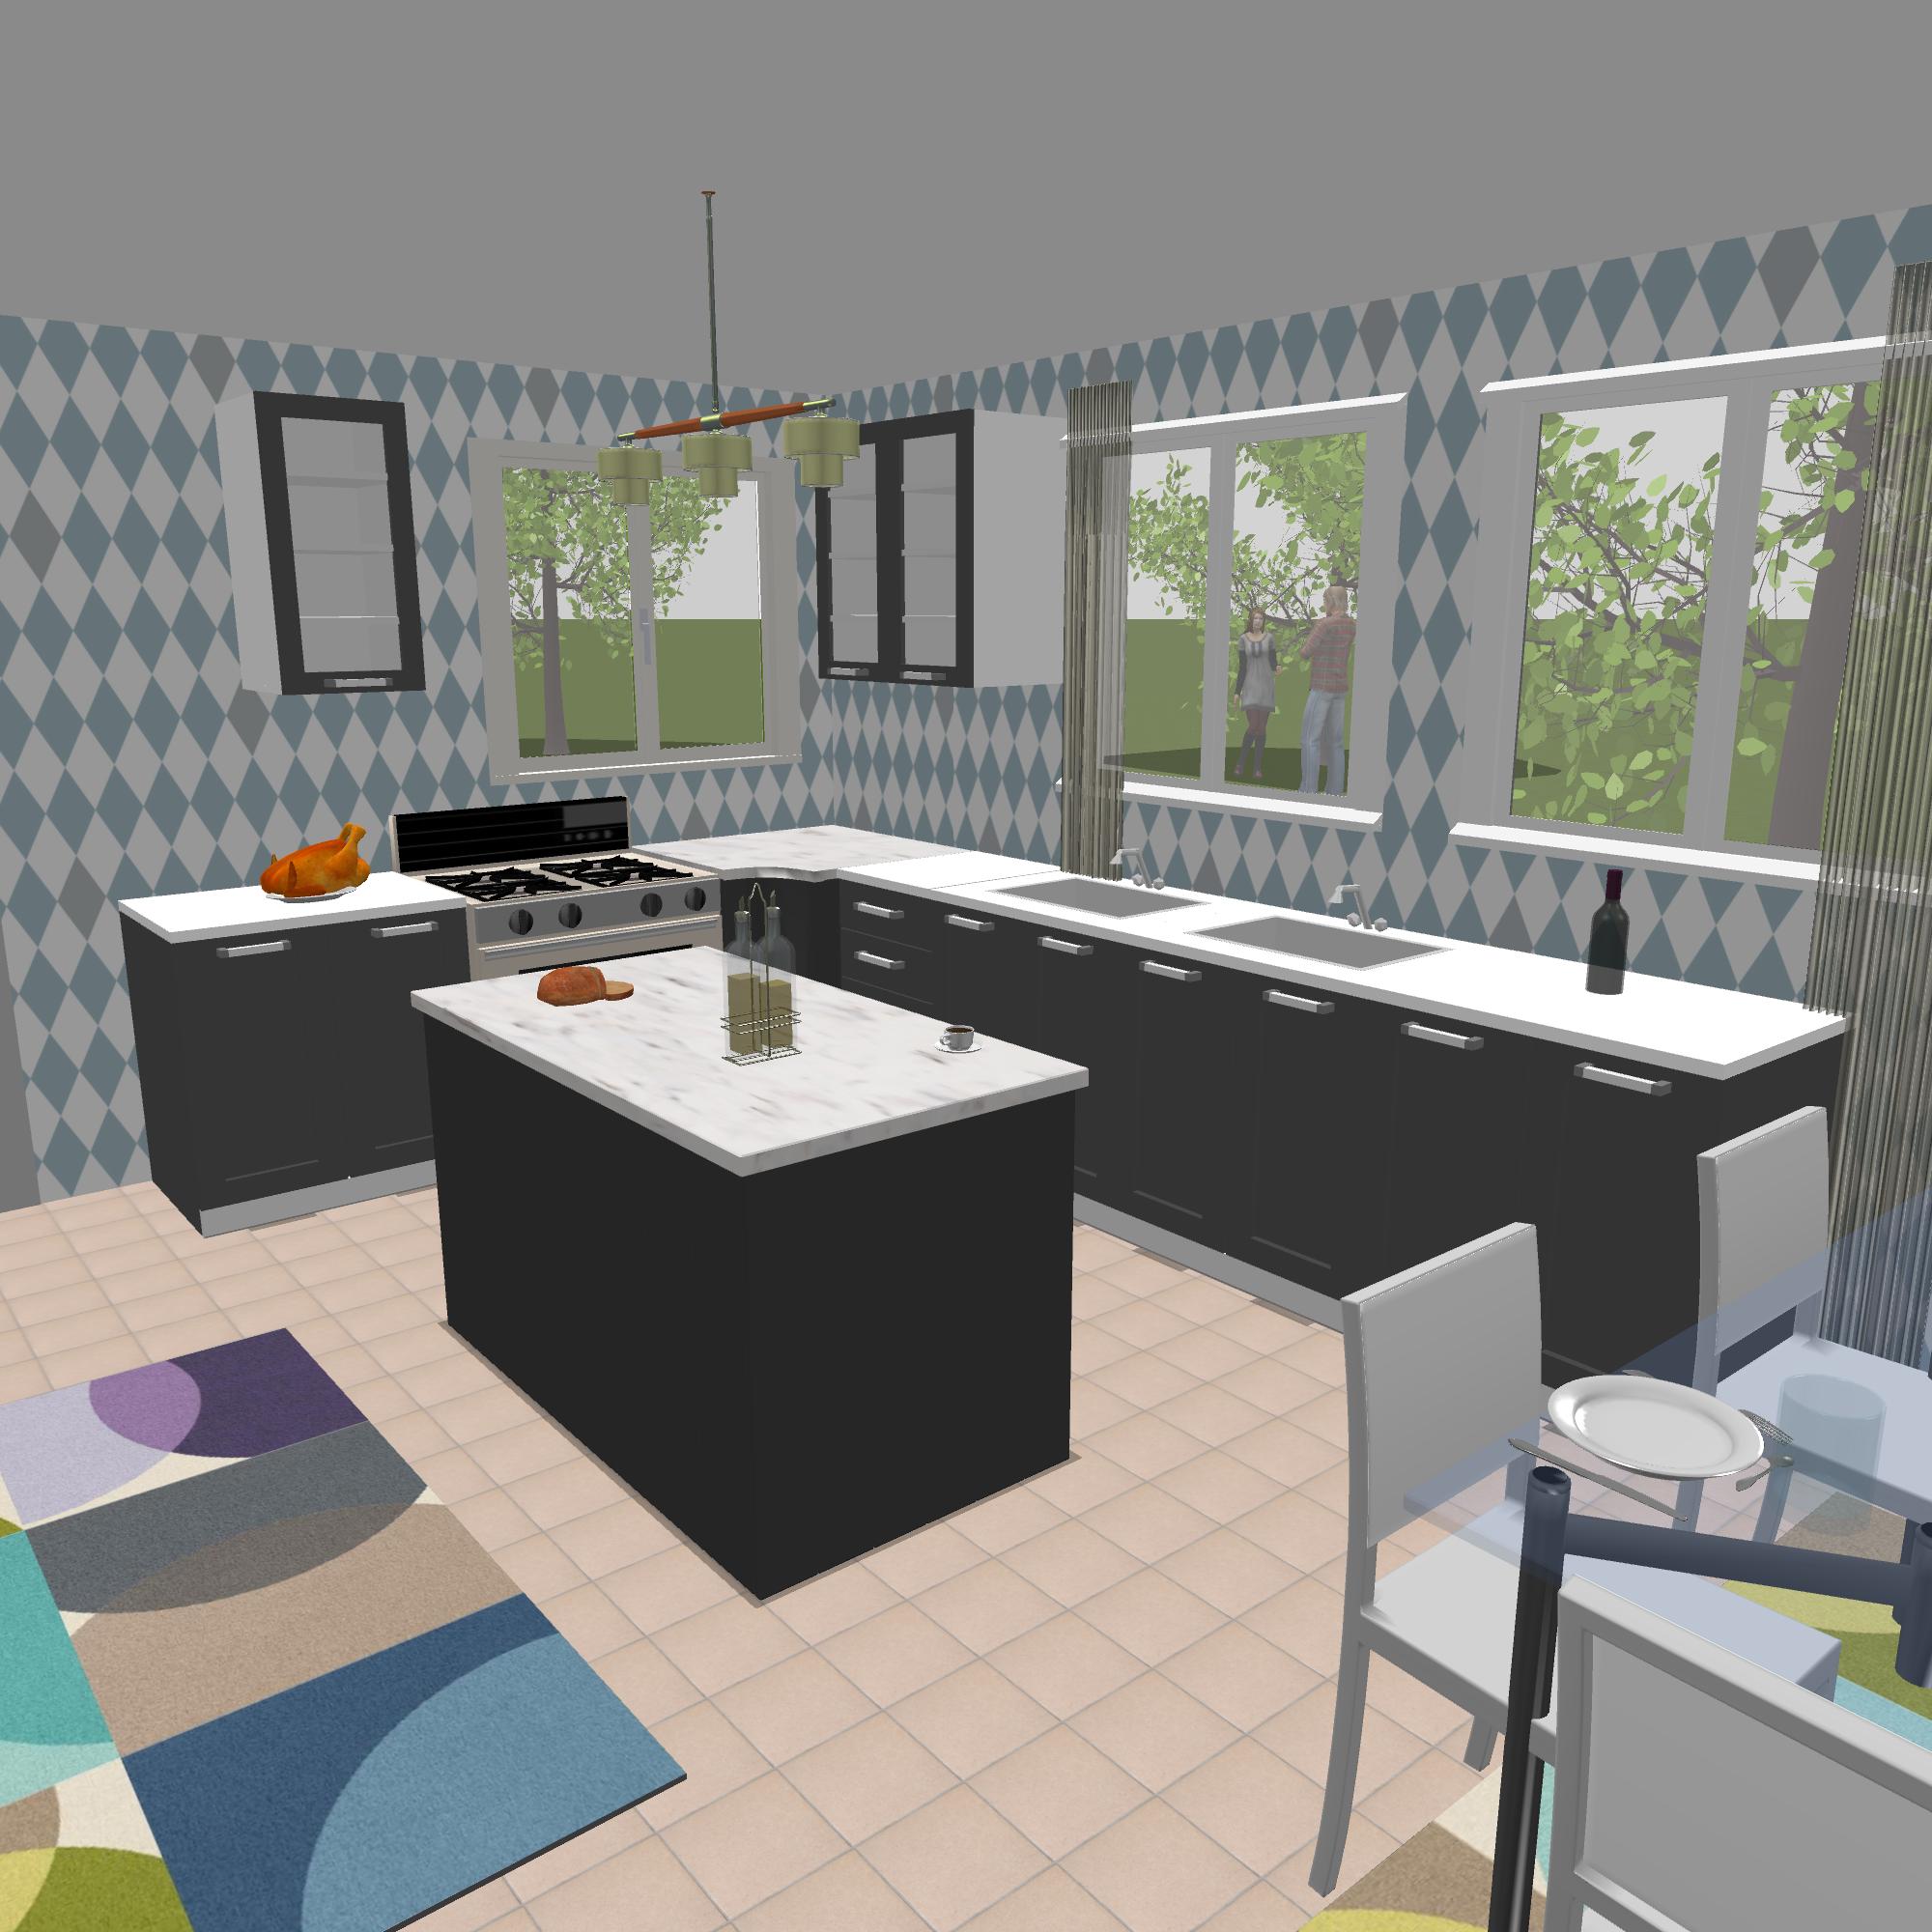 120sqm_kitchen.png